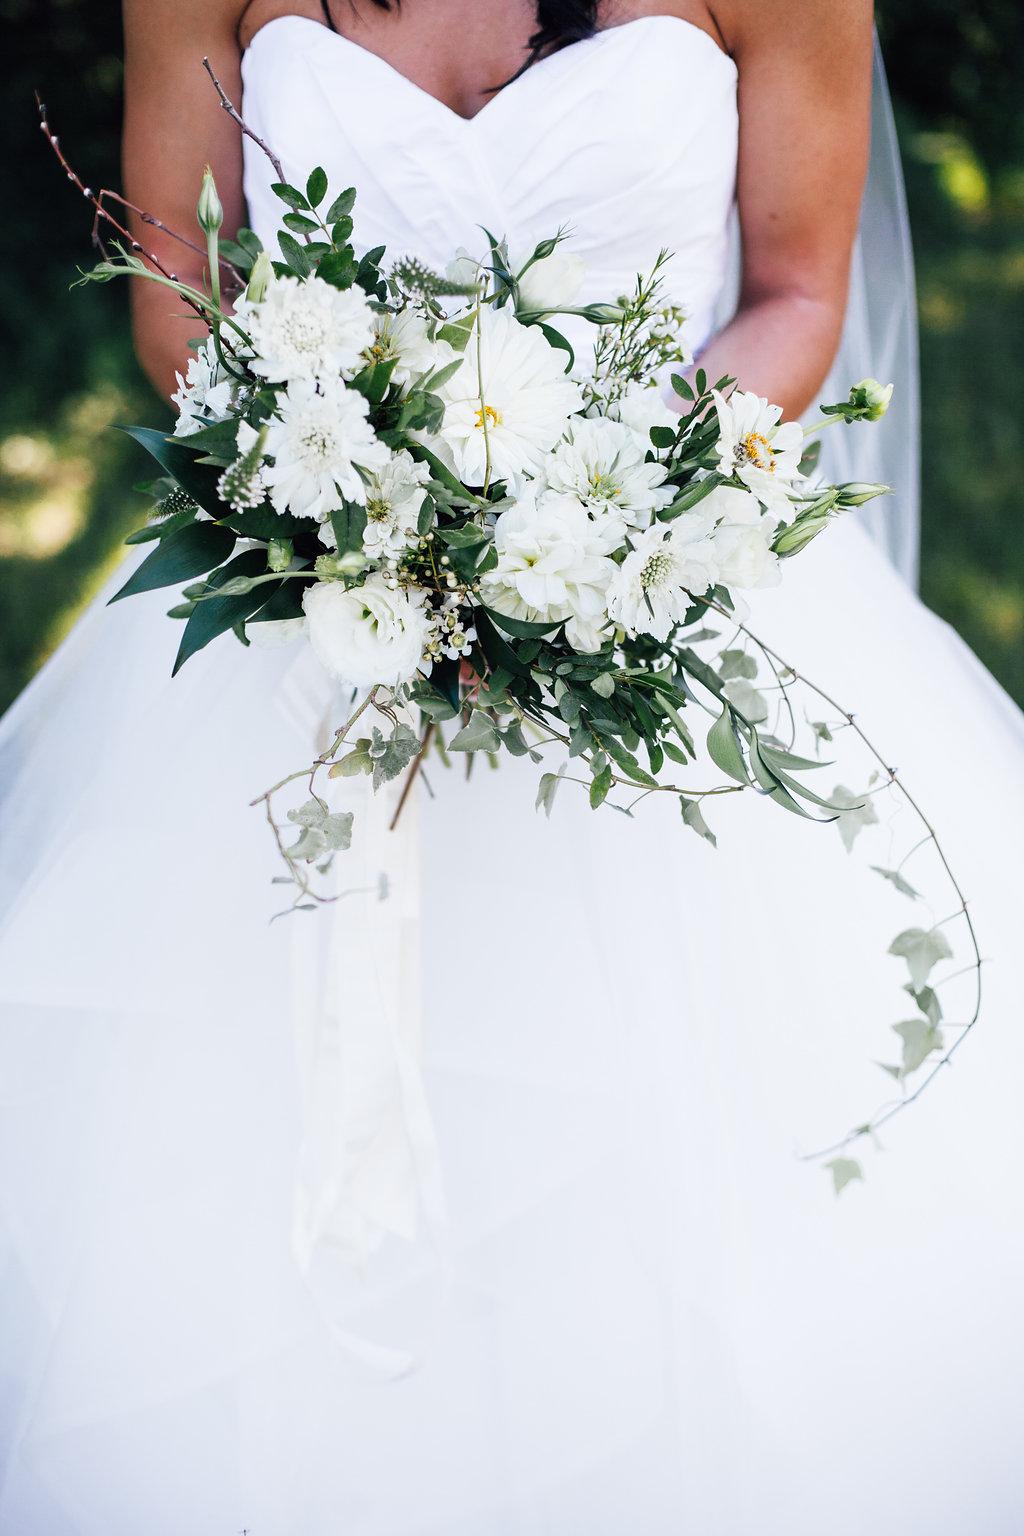 Rustic White Wedding Bouquet - Stone House Creative